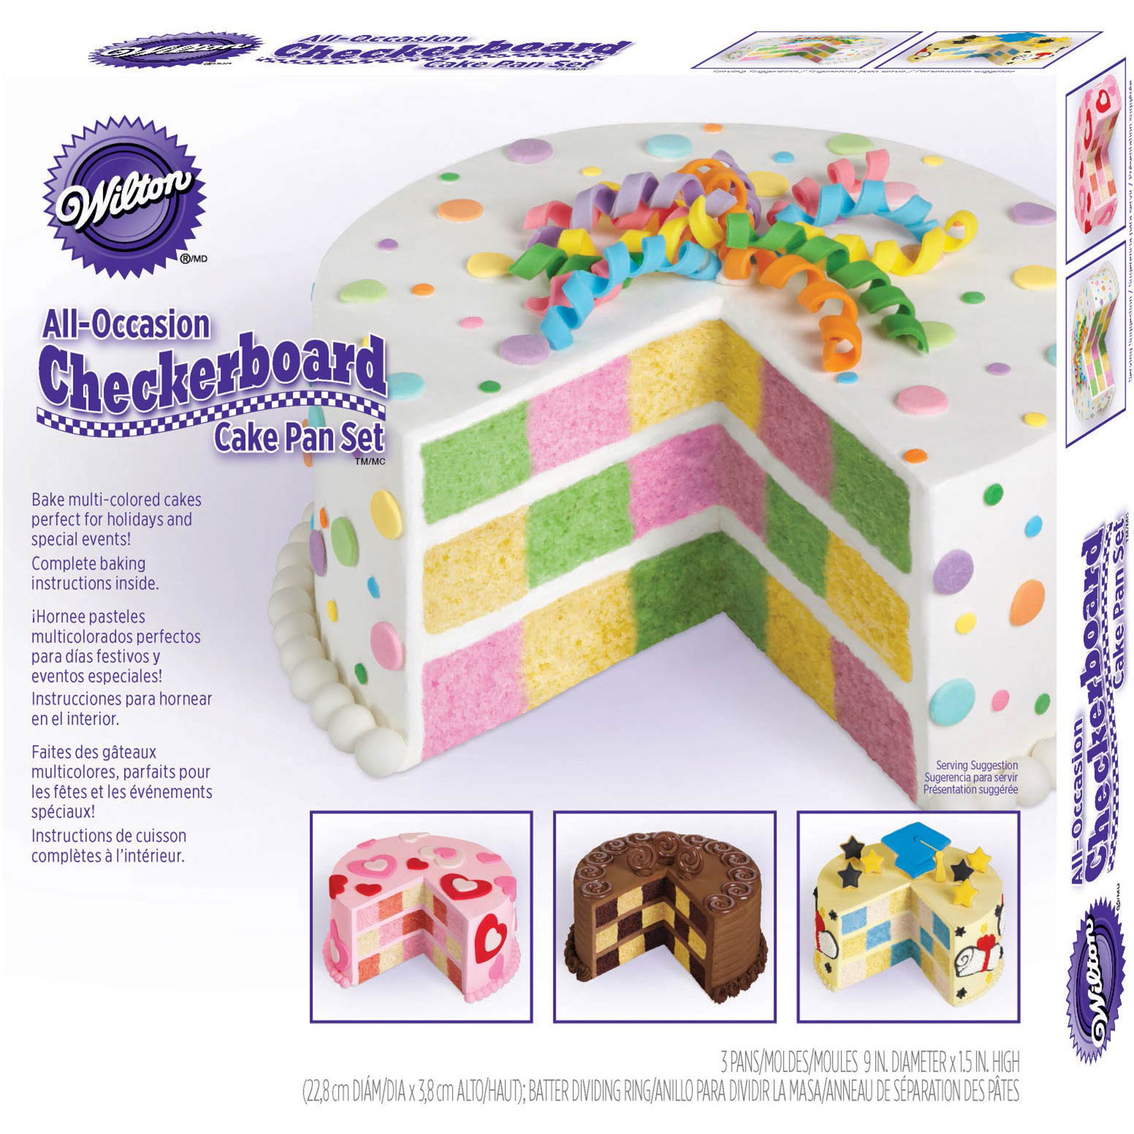 Multicolor Nordic Ware Checkerboard Cake Ring